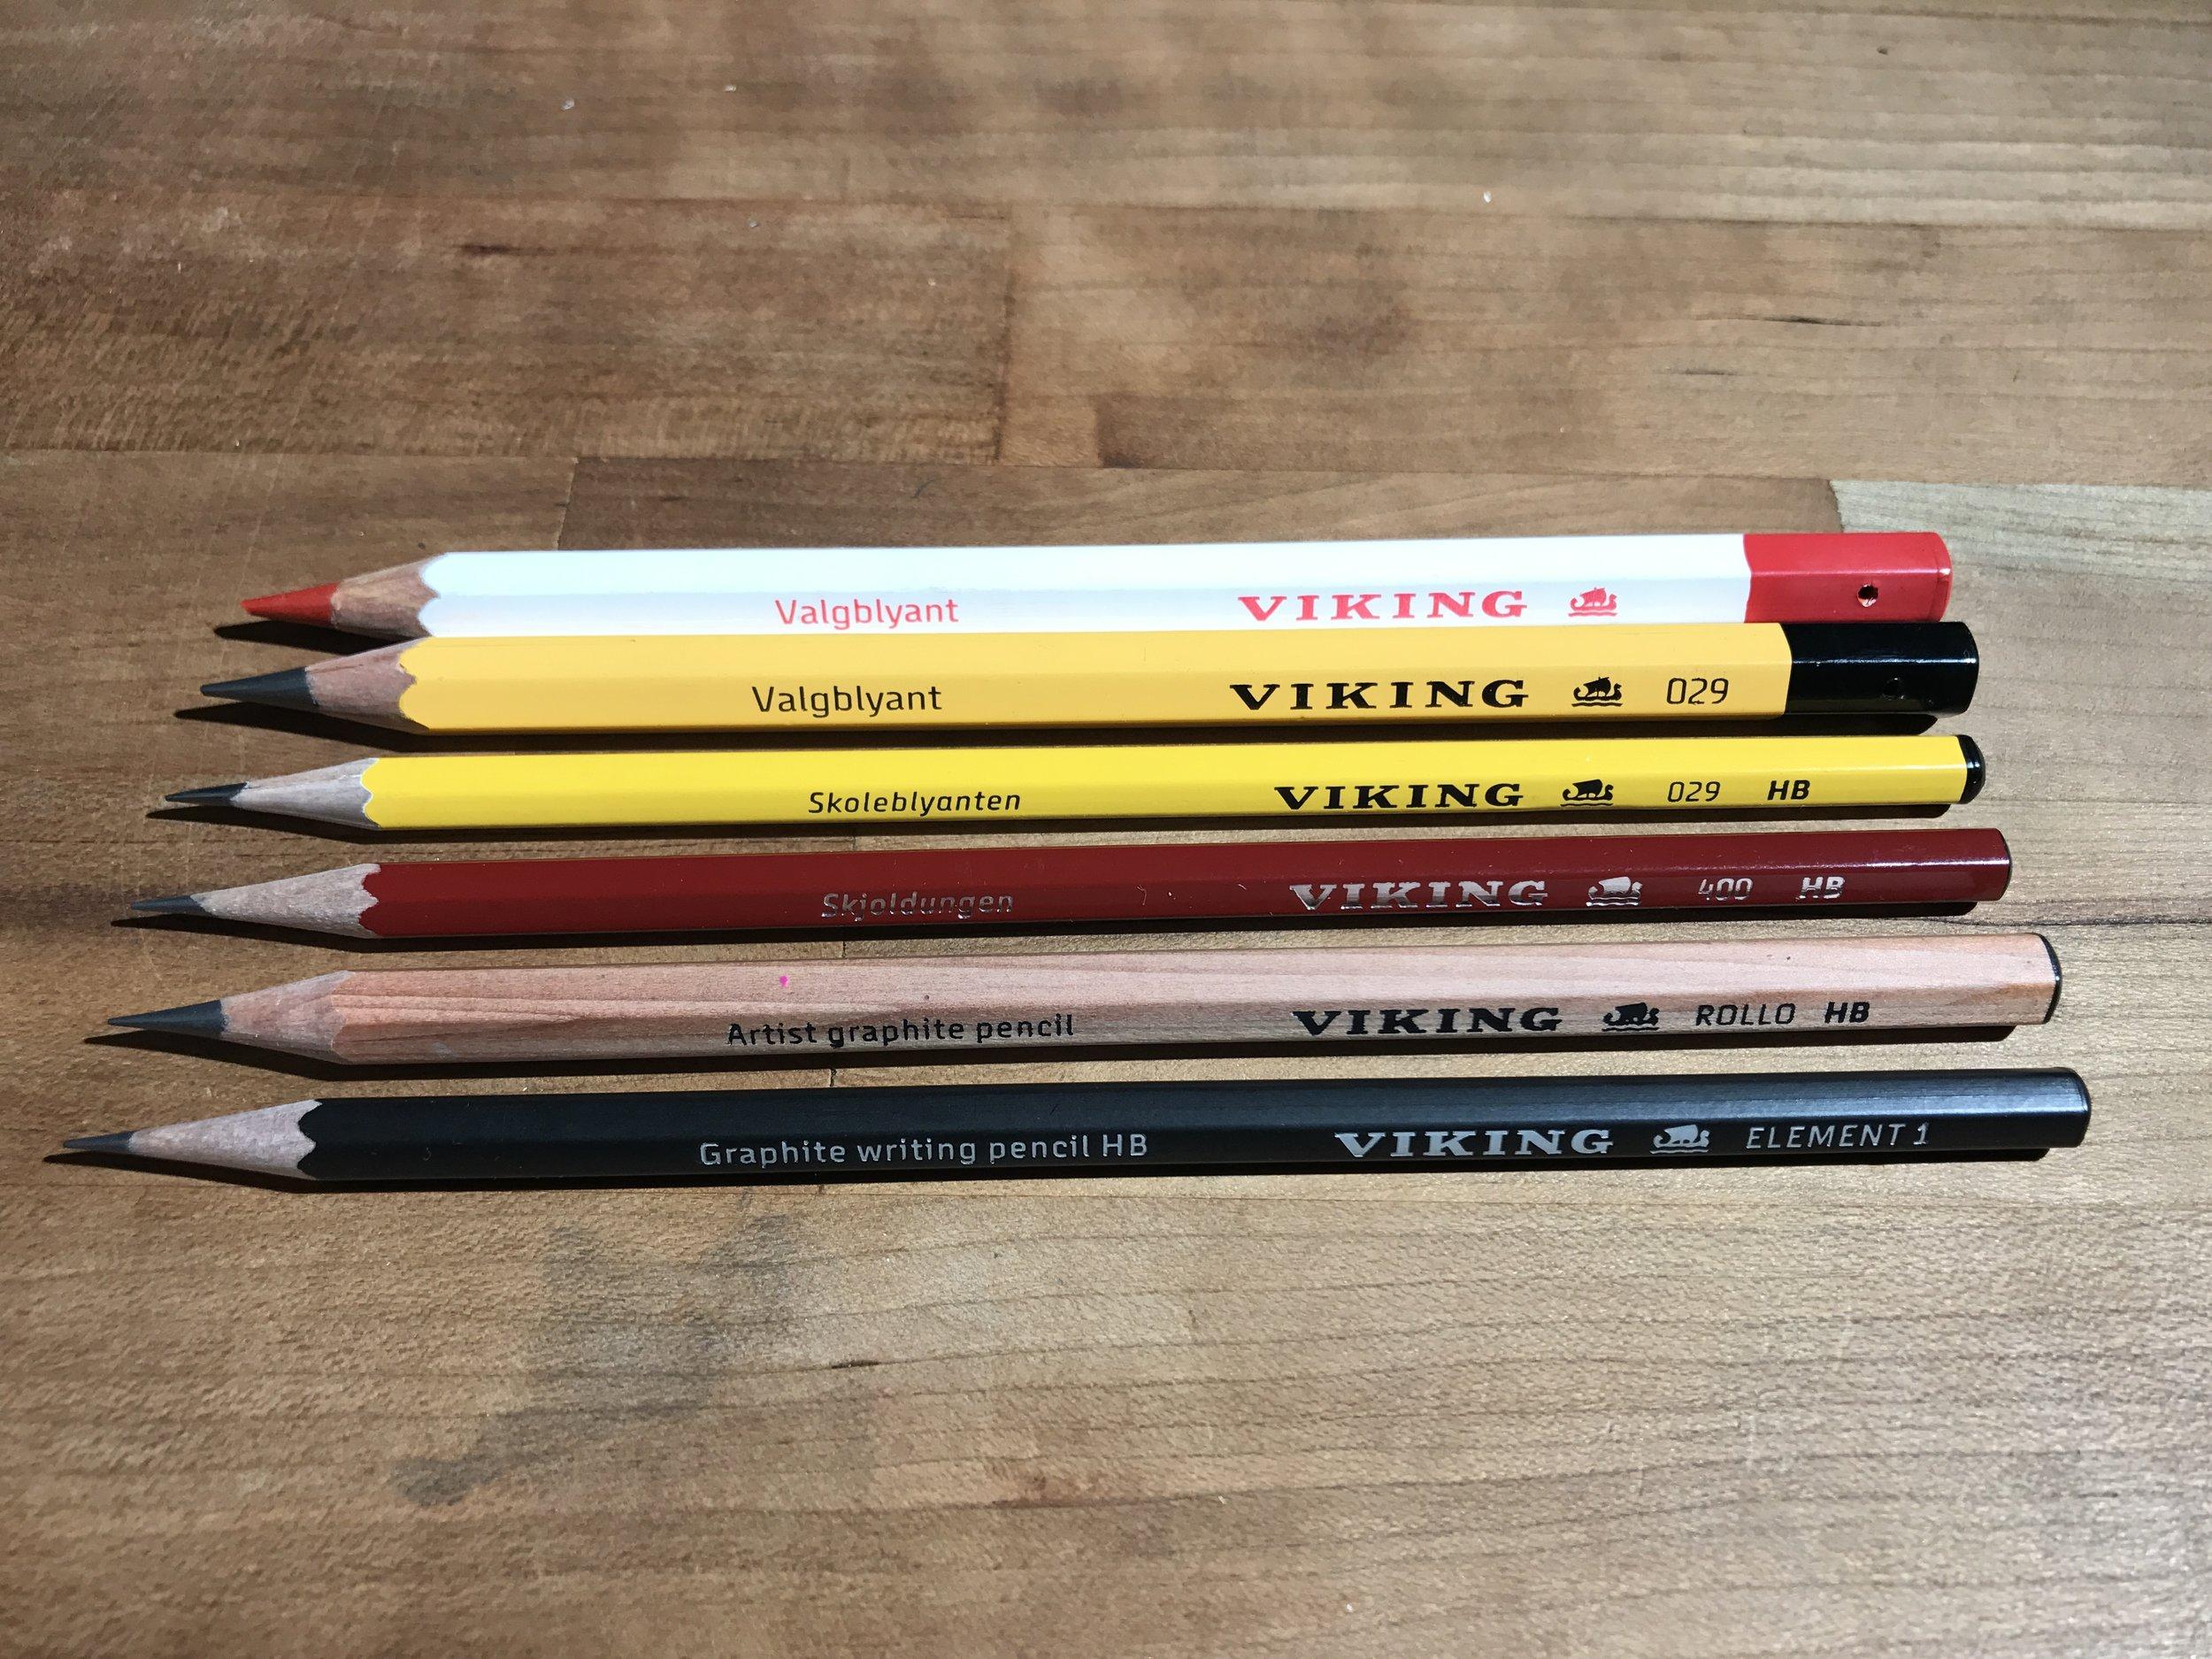 A good looking set of sticks.